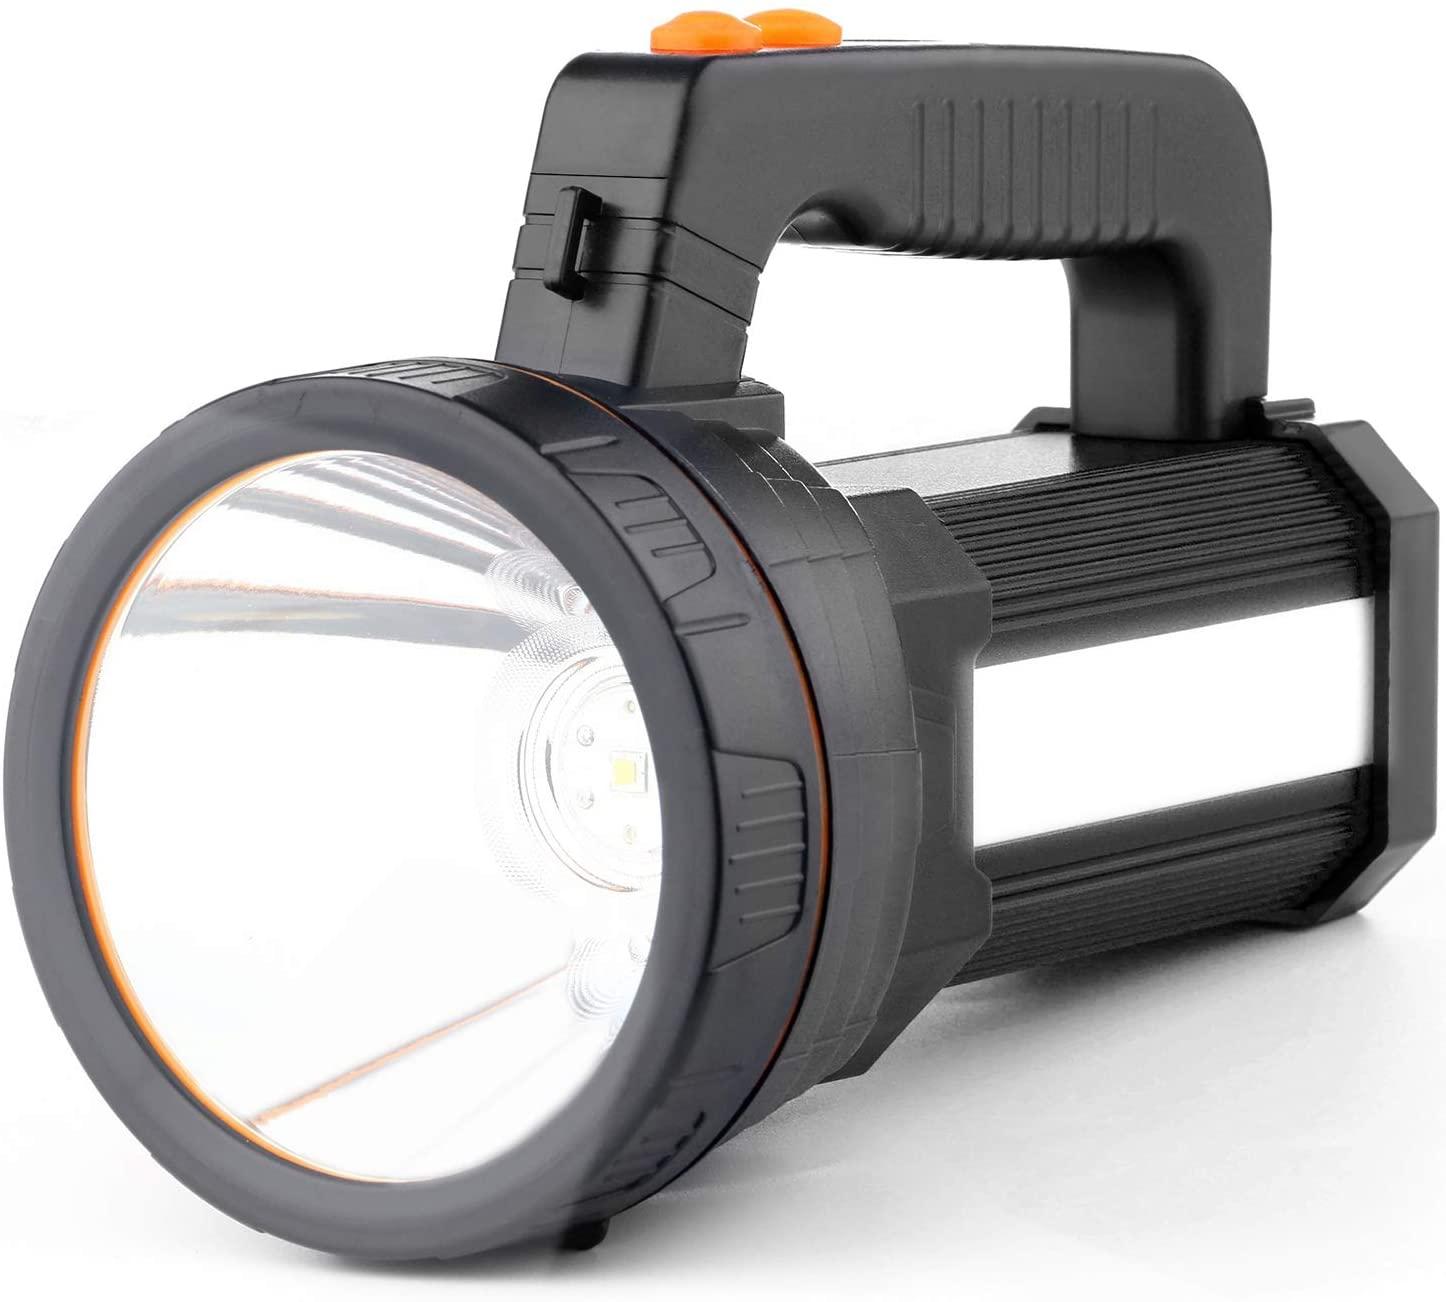 Rechargeable Spotlight Flashlight,Super Bright Handheld Flashlight,5 Light Modes,6000mAh Power Bank,Waterproof,LED Tactical Flashlight for Hurricane Emergency,Hiking, Home (Black)